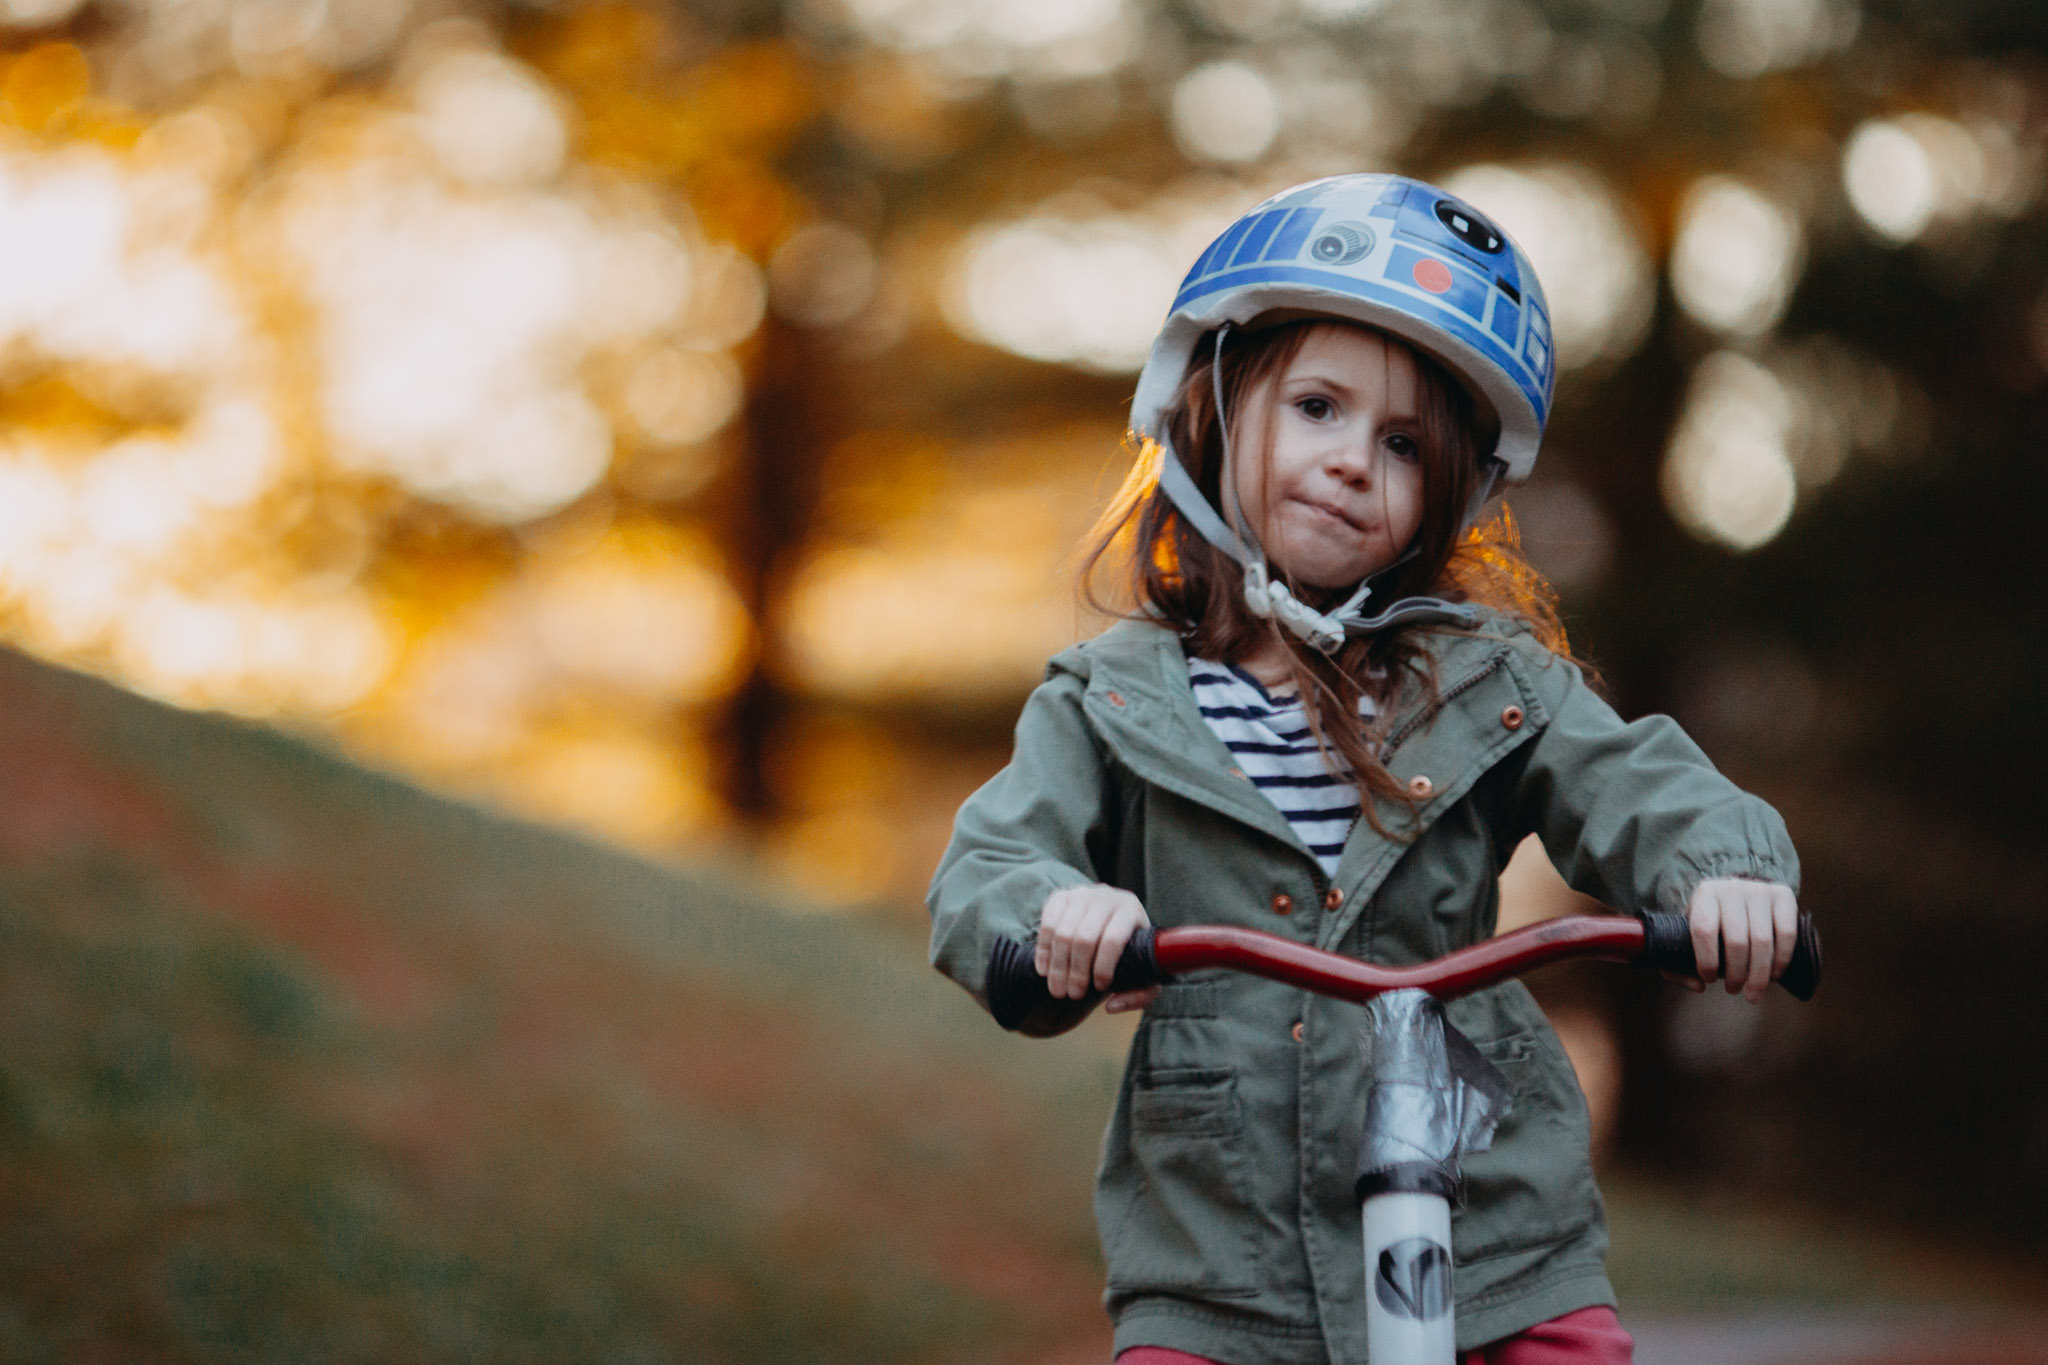 girl bike R2D2 sunset golden hour childhood lifestyle documentary Ashburn Virginia Marti Austin Photography